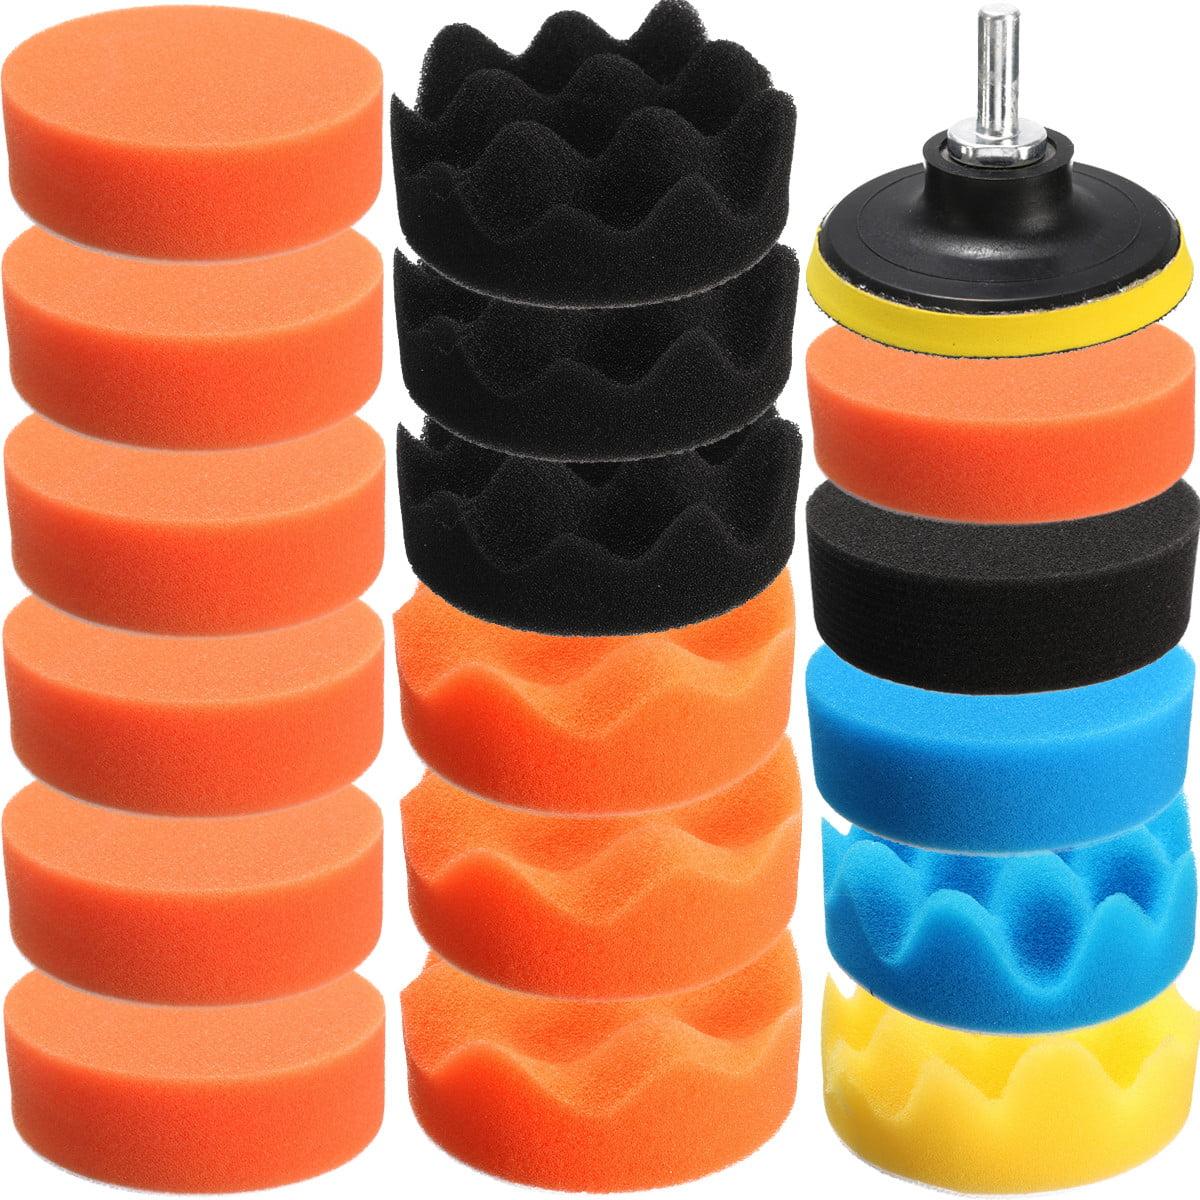 "19PCS 3""(80mm) Flat Sponge Buff Buffing Pad Polishing Pad Kit Set Compound Drill Adapter For Car Polisher"